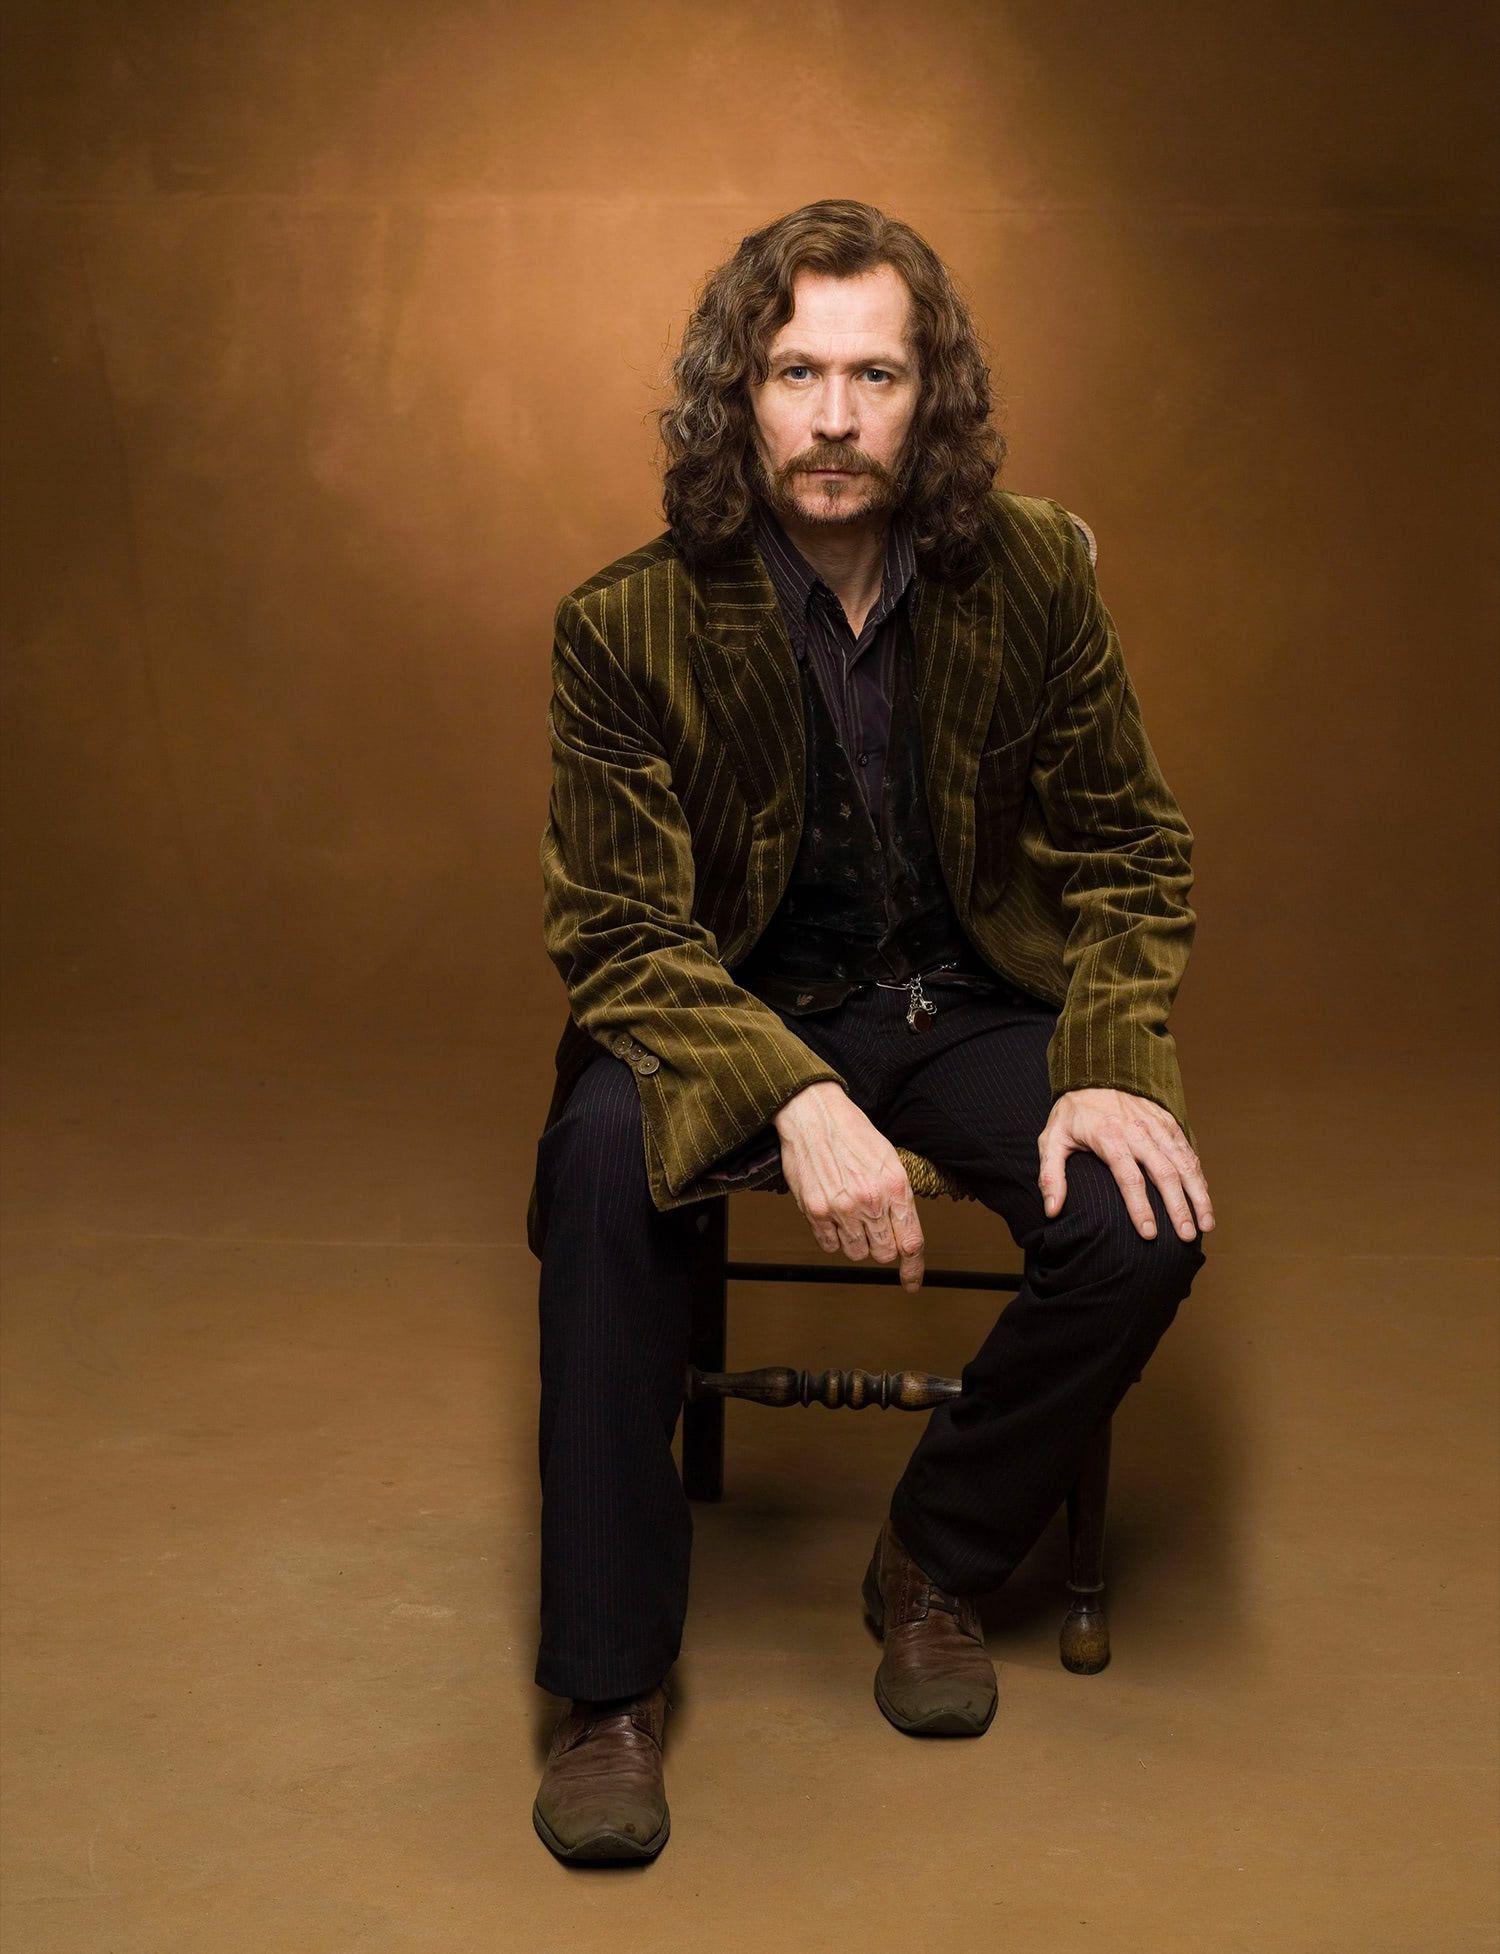 Sirius Black Portrait Ootp Sirius Black Gary Oldman Sirius